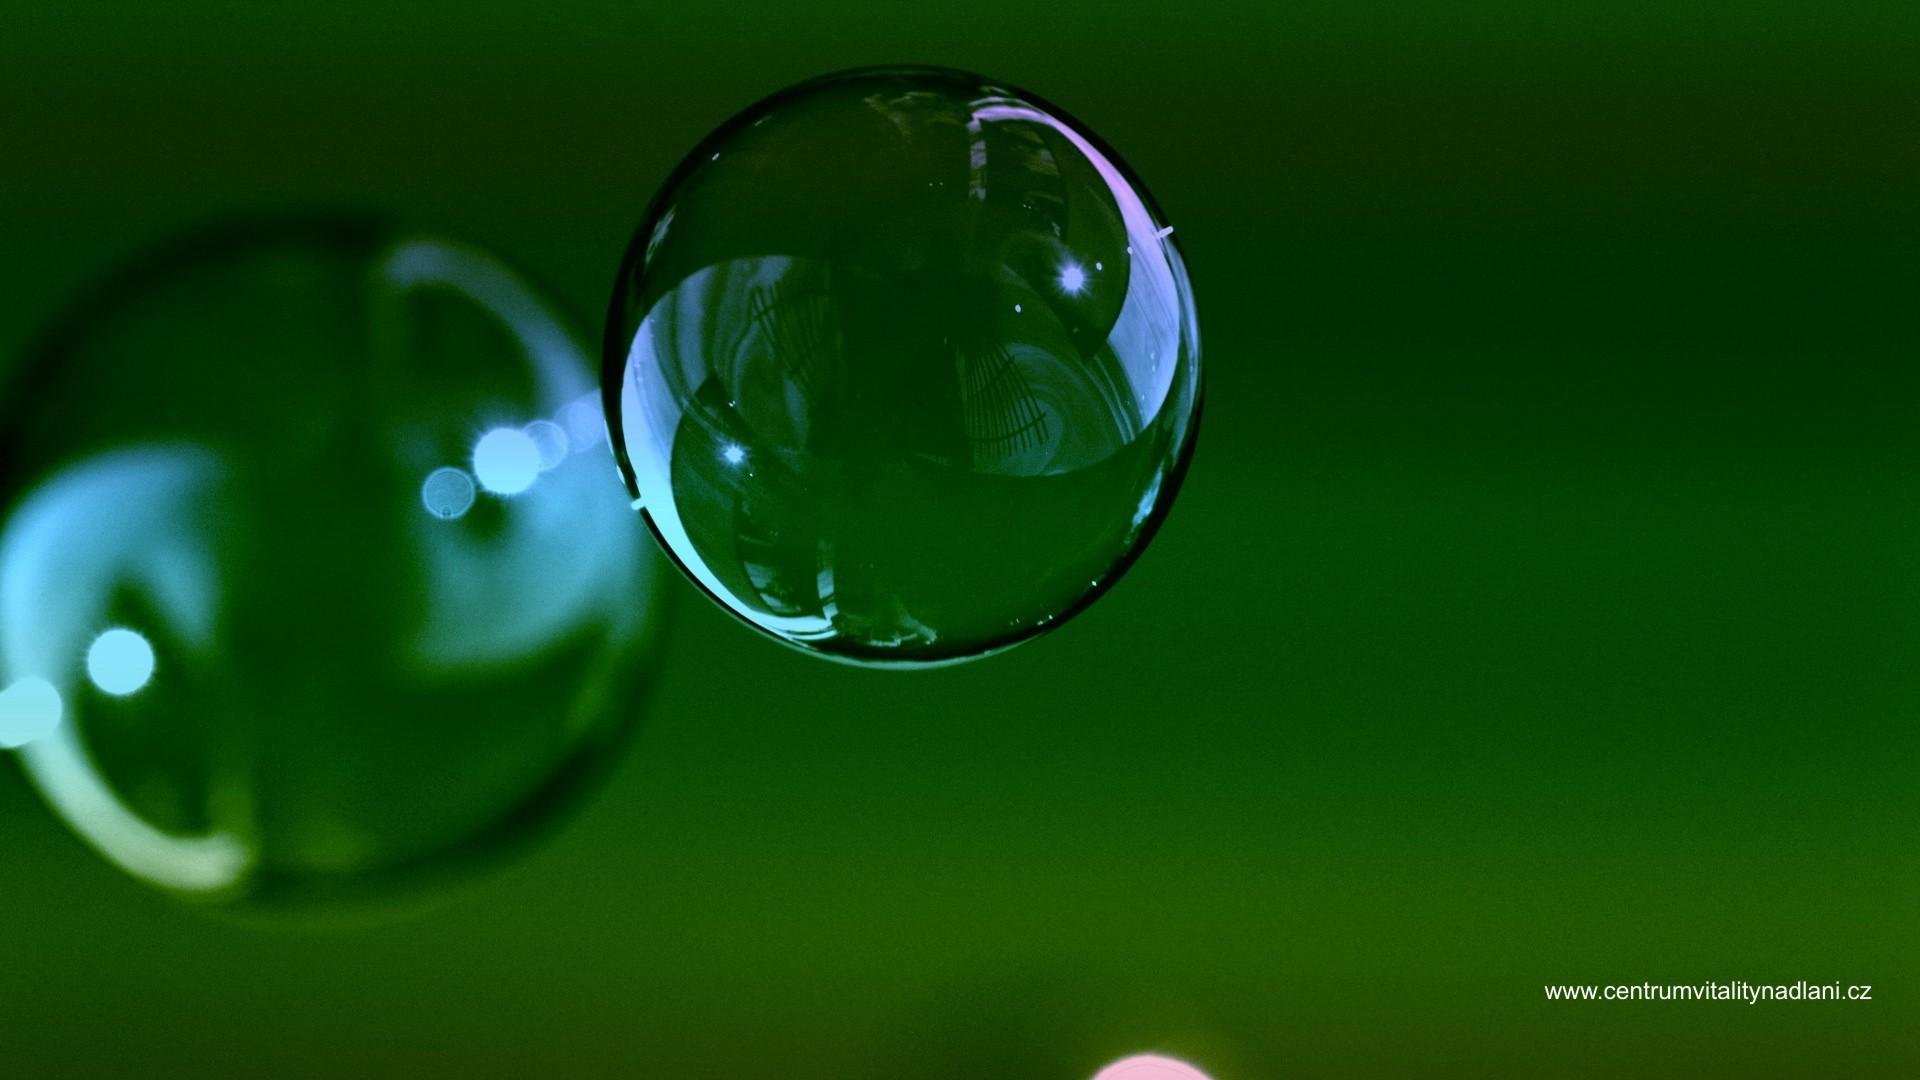 Bublina.jpg